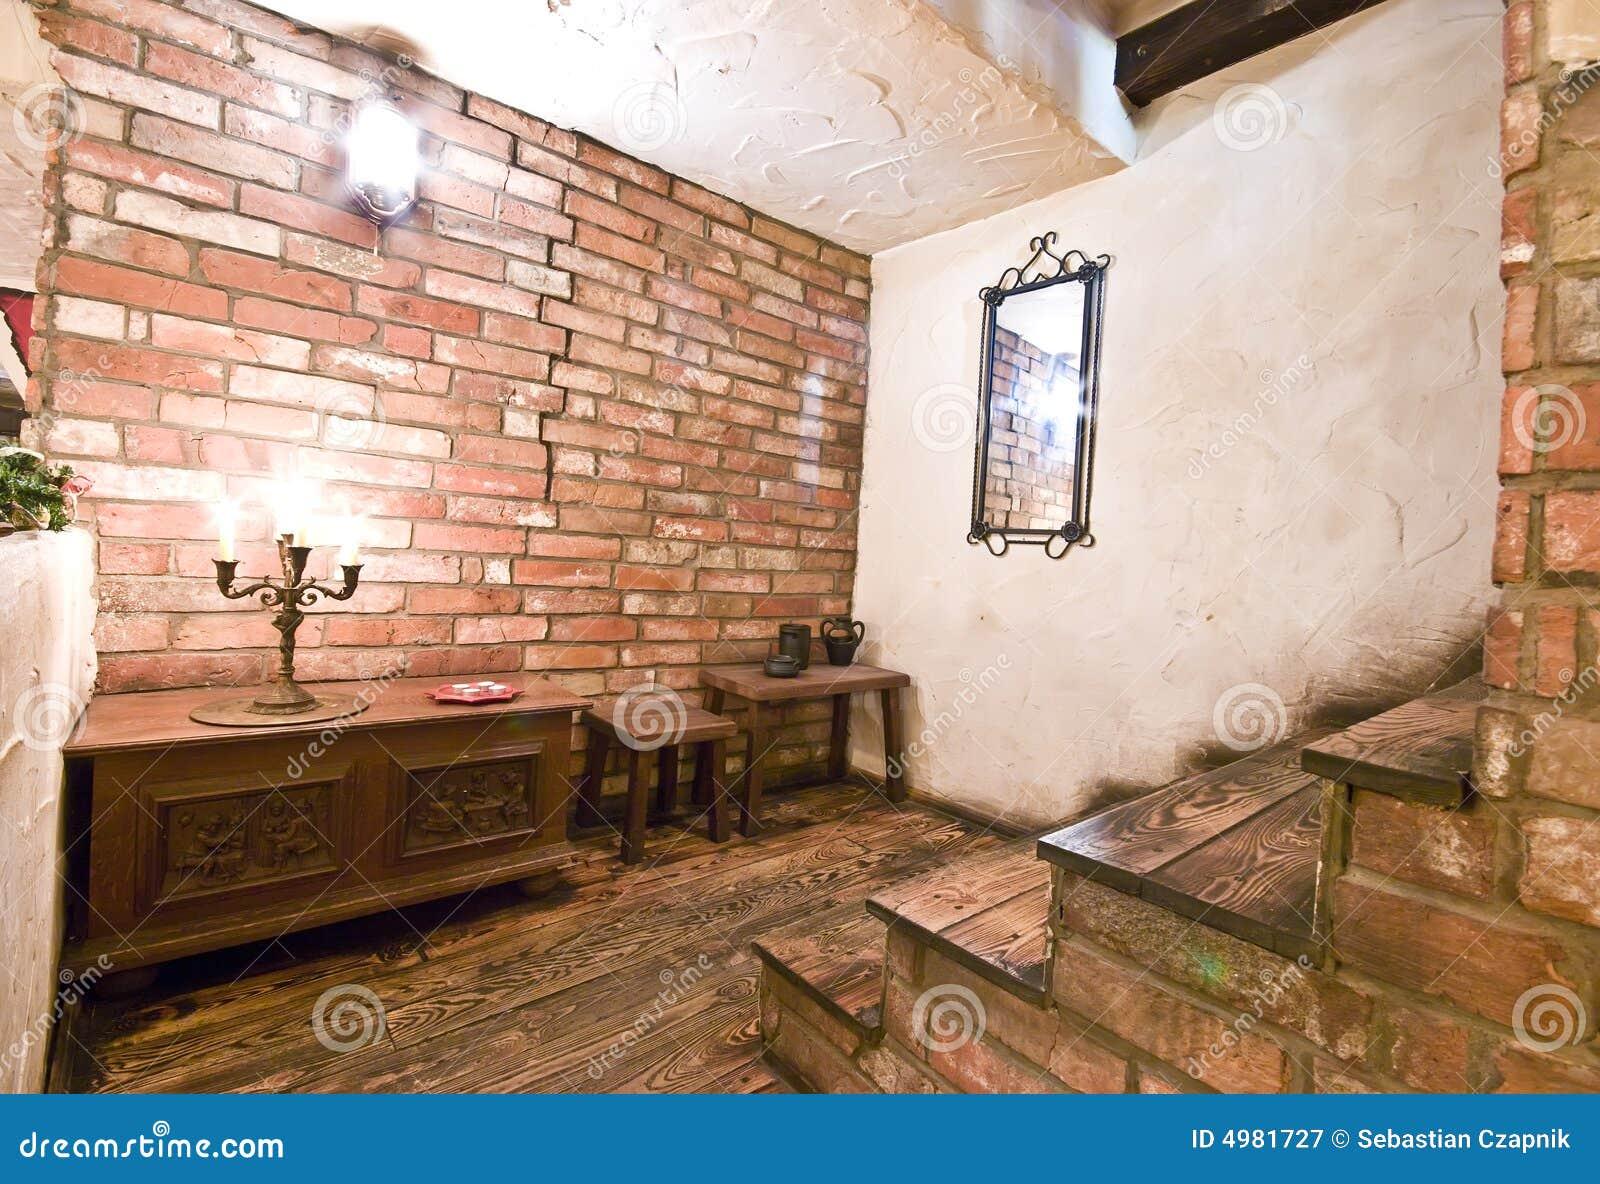 Rustic Interior Stairs Stock Image Image Of Quiet Poland 4981727 - Escaleras-rusticas-de-interior